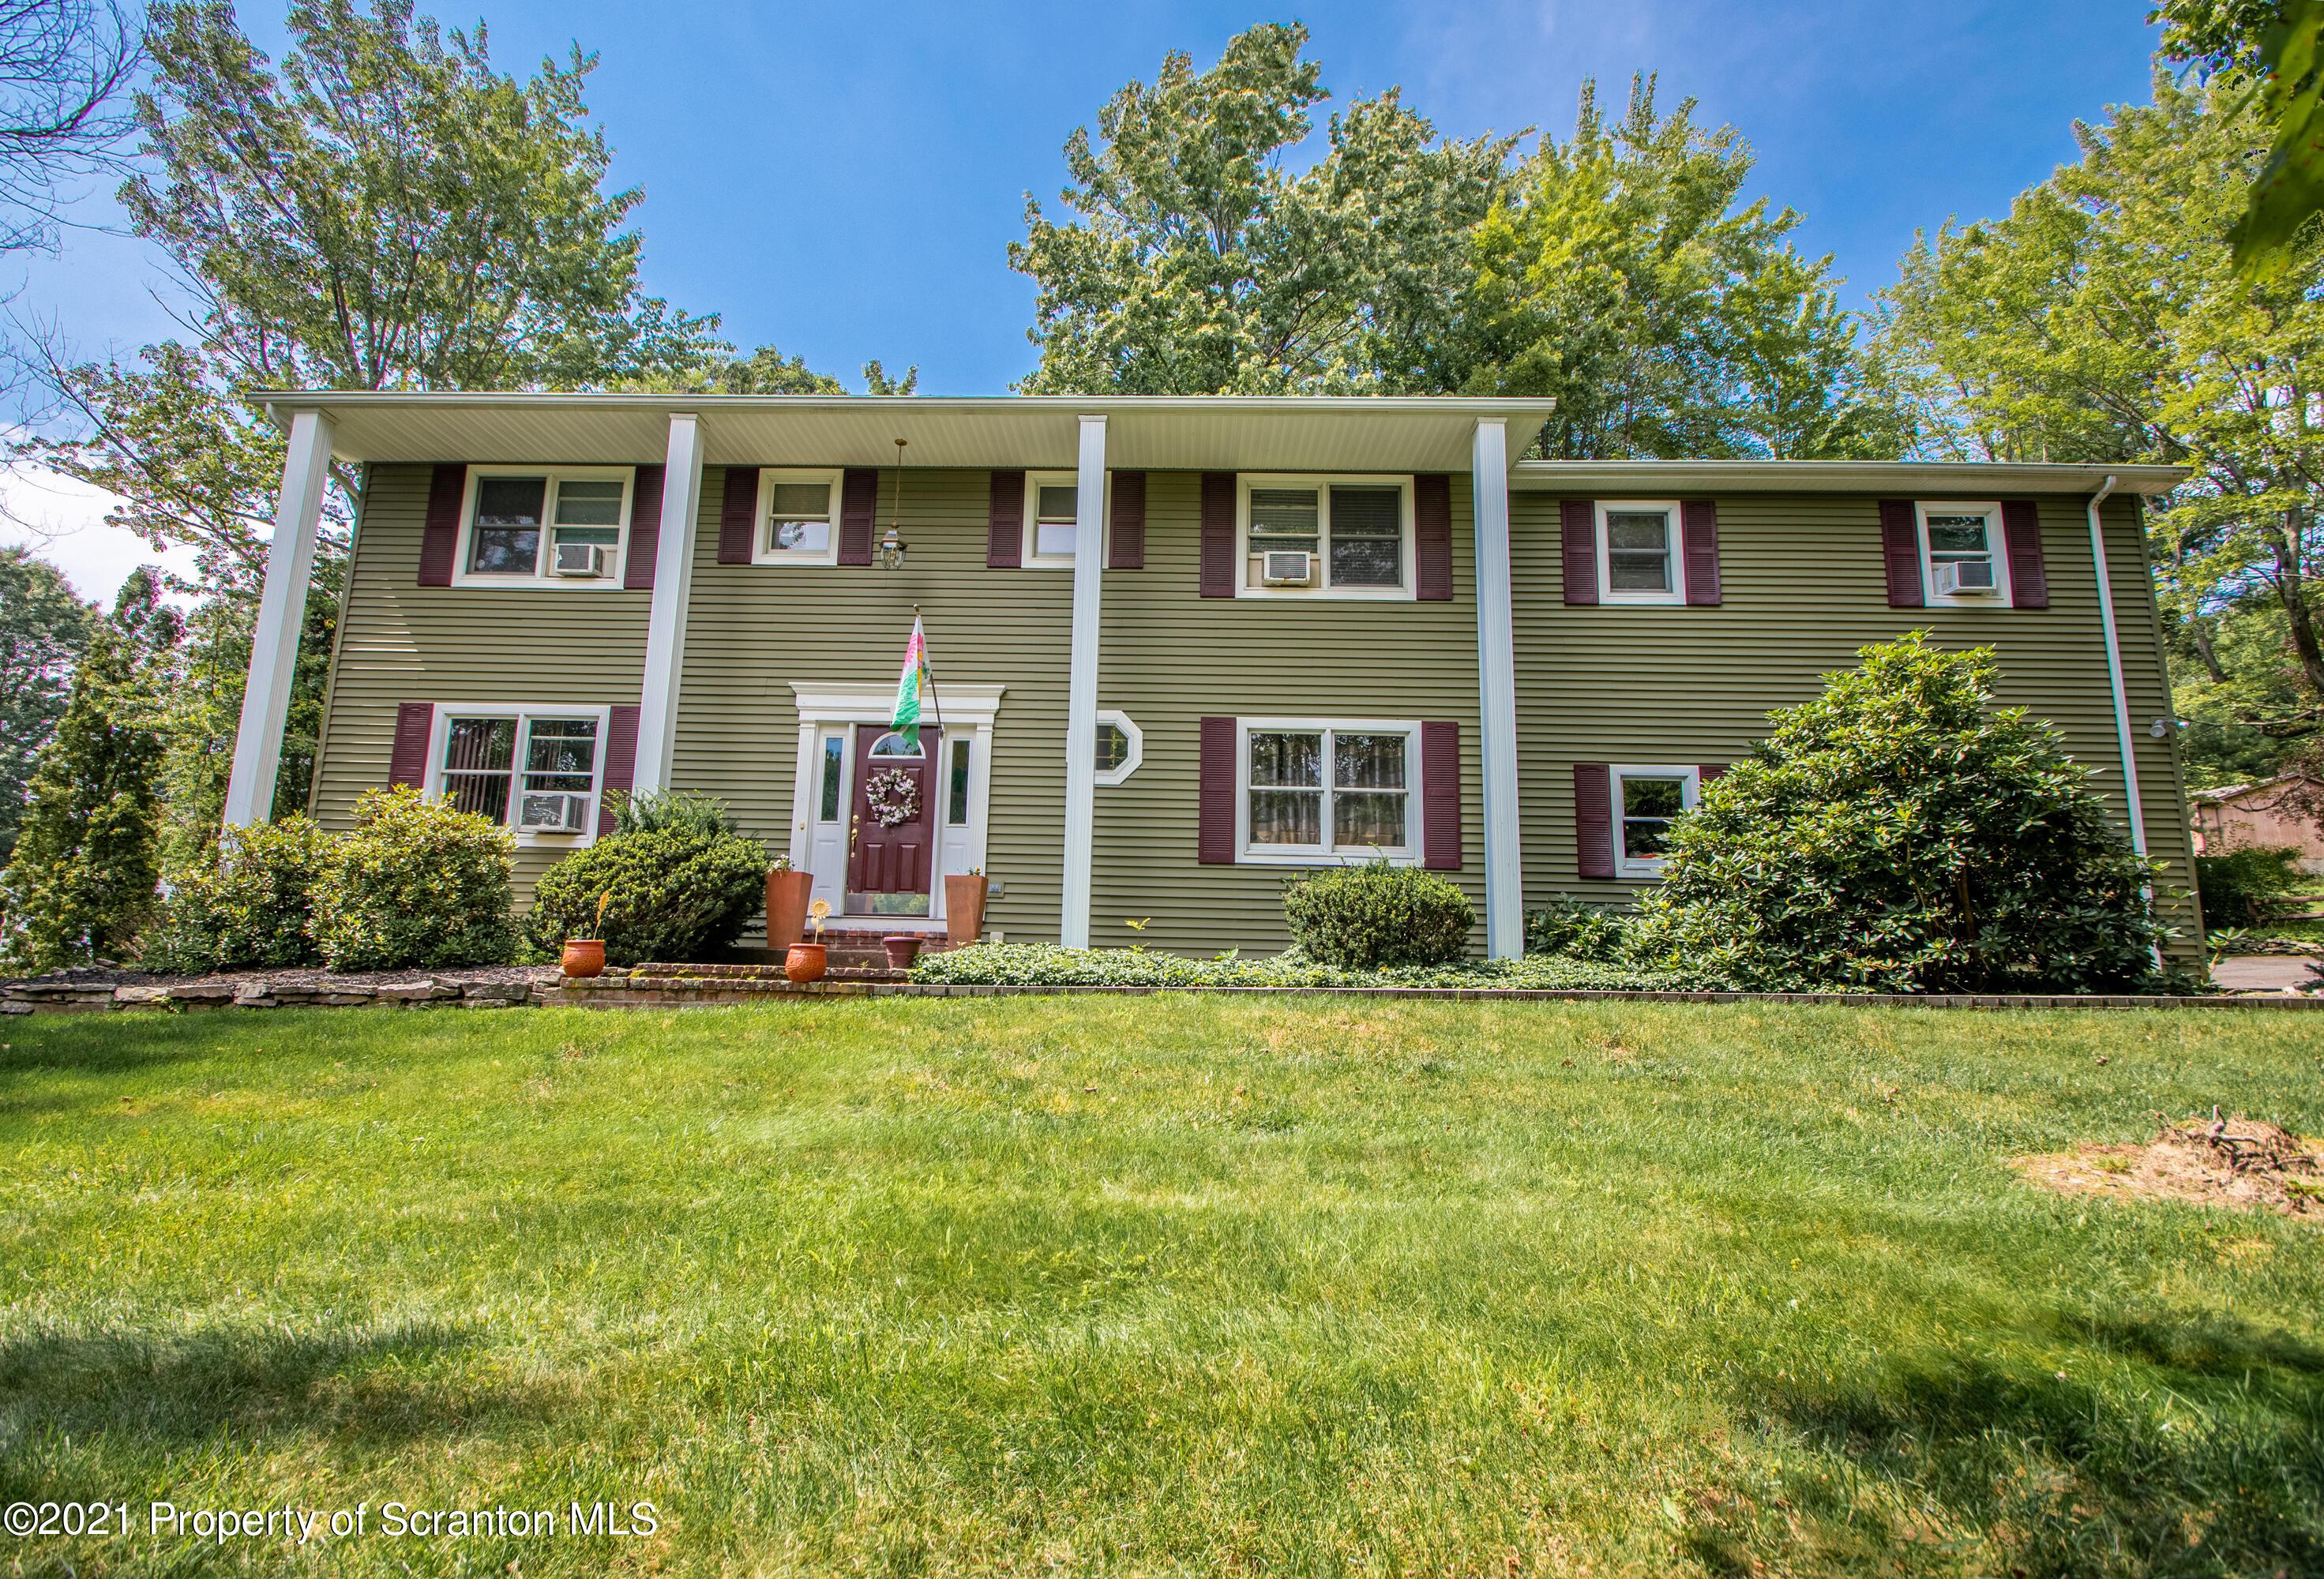 3 White Birch Lane, Glenburn, Pennsylvania 18411, 6 Bedrooms Bedrooms, 11 Rooms Rooms,3 BathroomsBathrooms,Single Family,For Sale,White Birch,21-3250